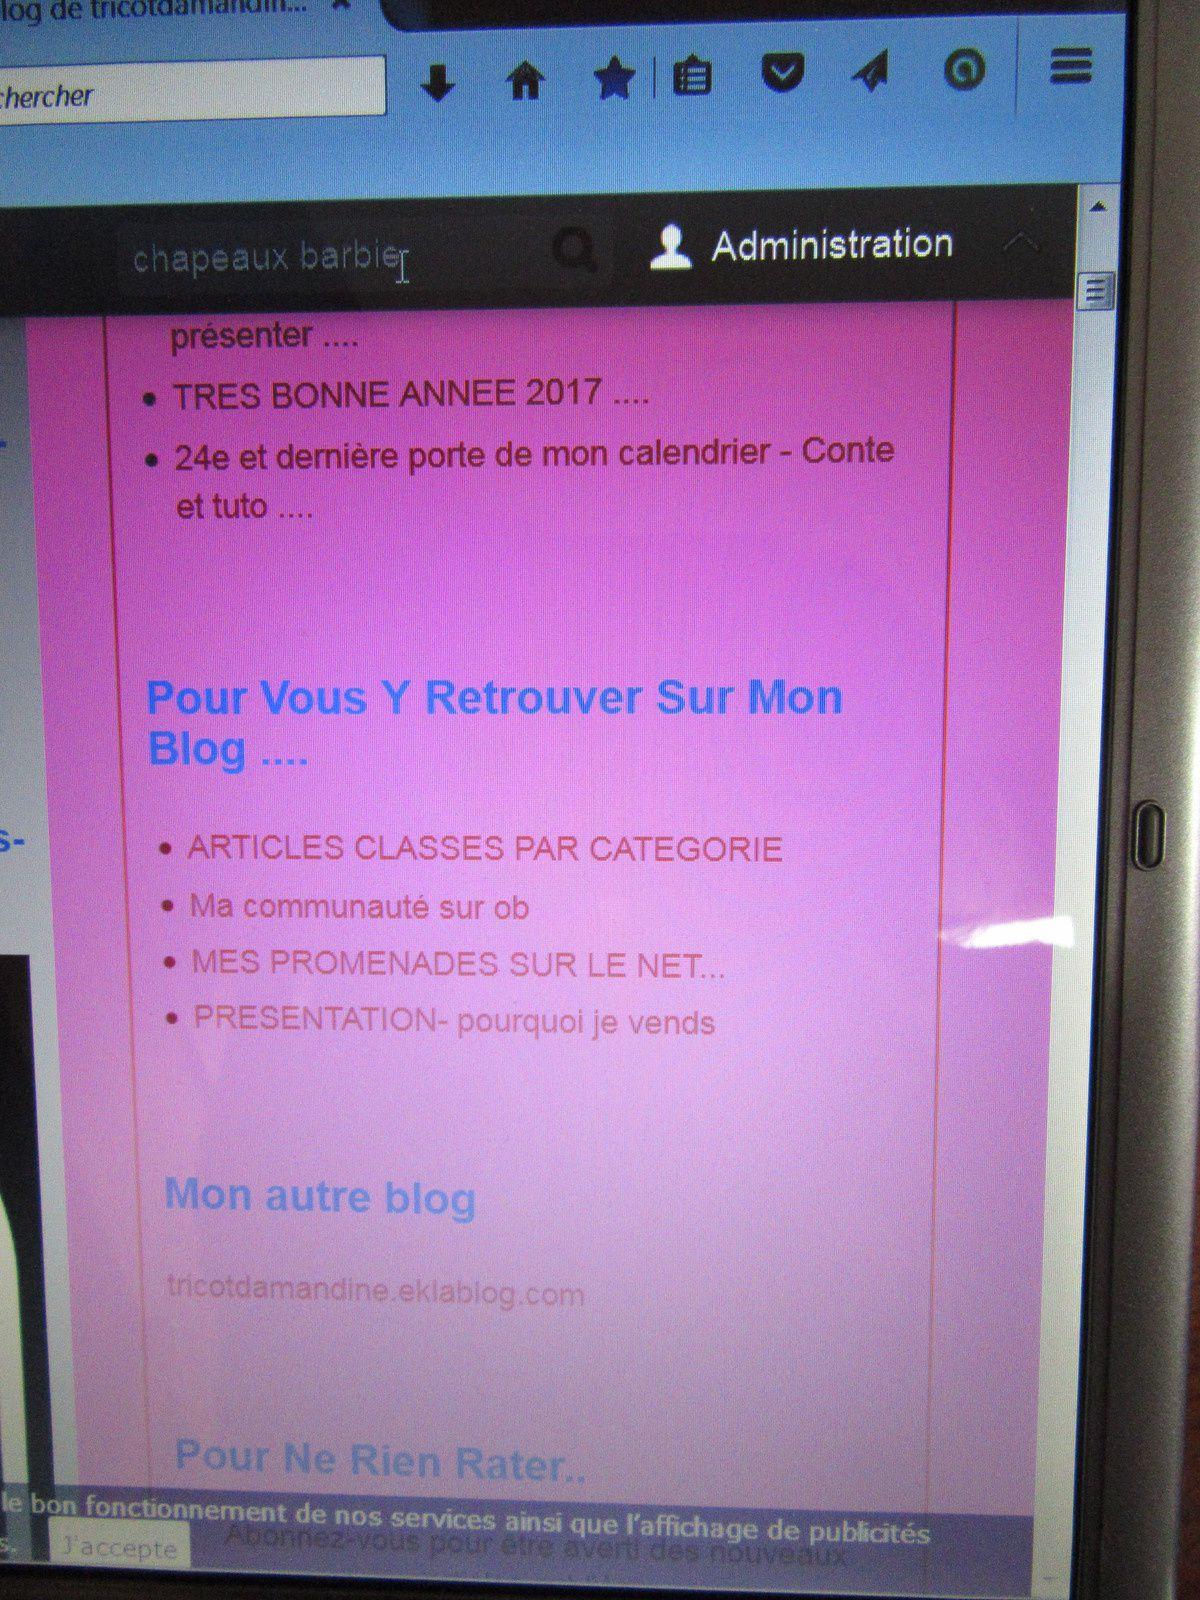 Mini mode d'emploi pour mon blog ....